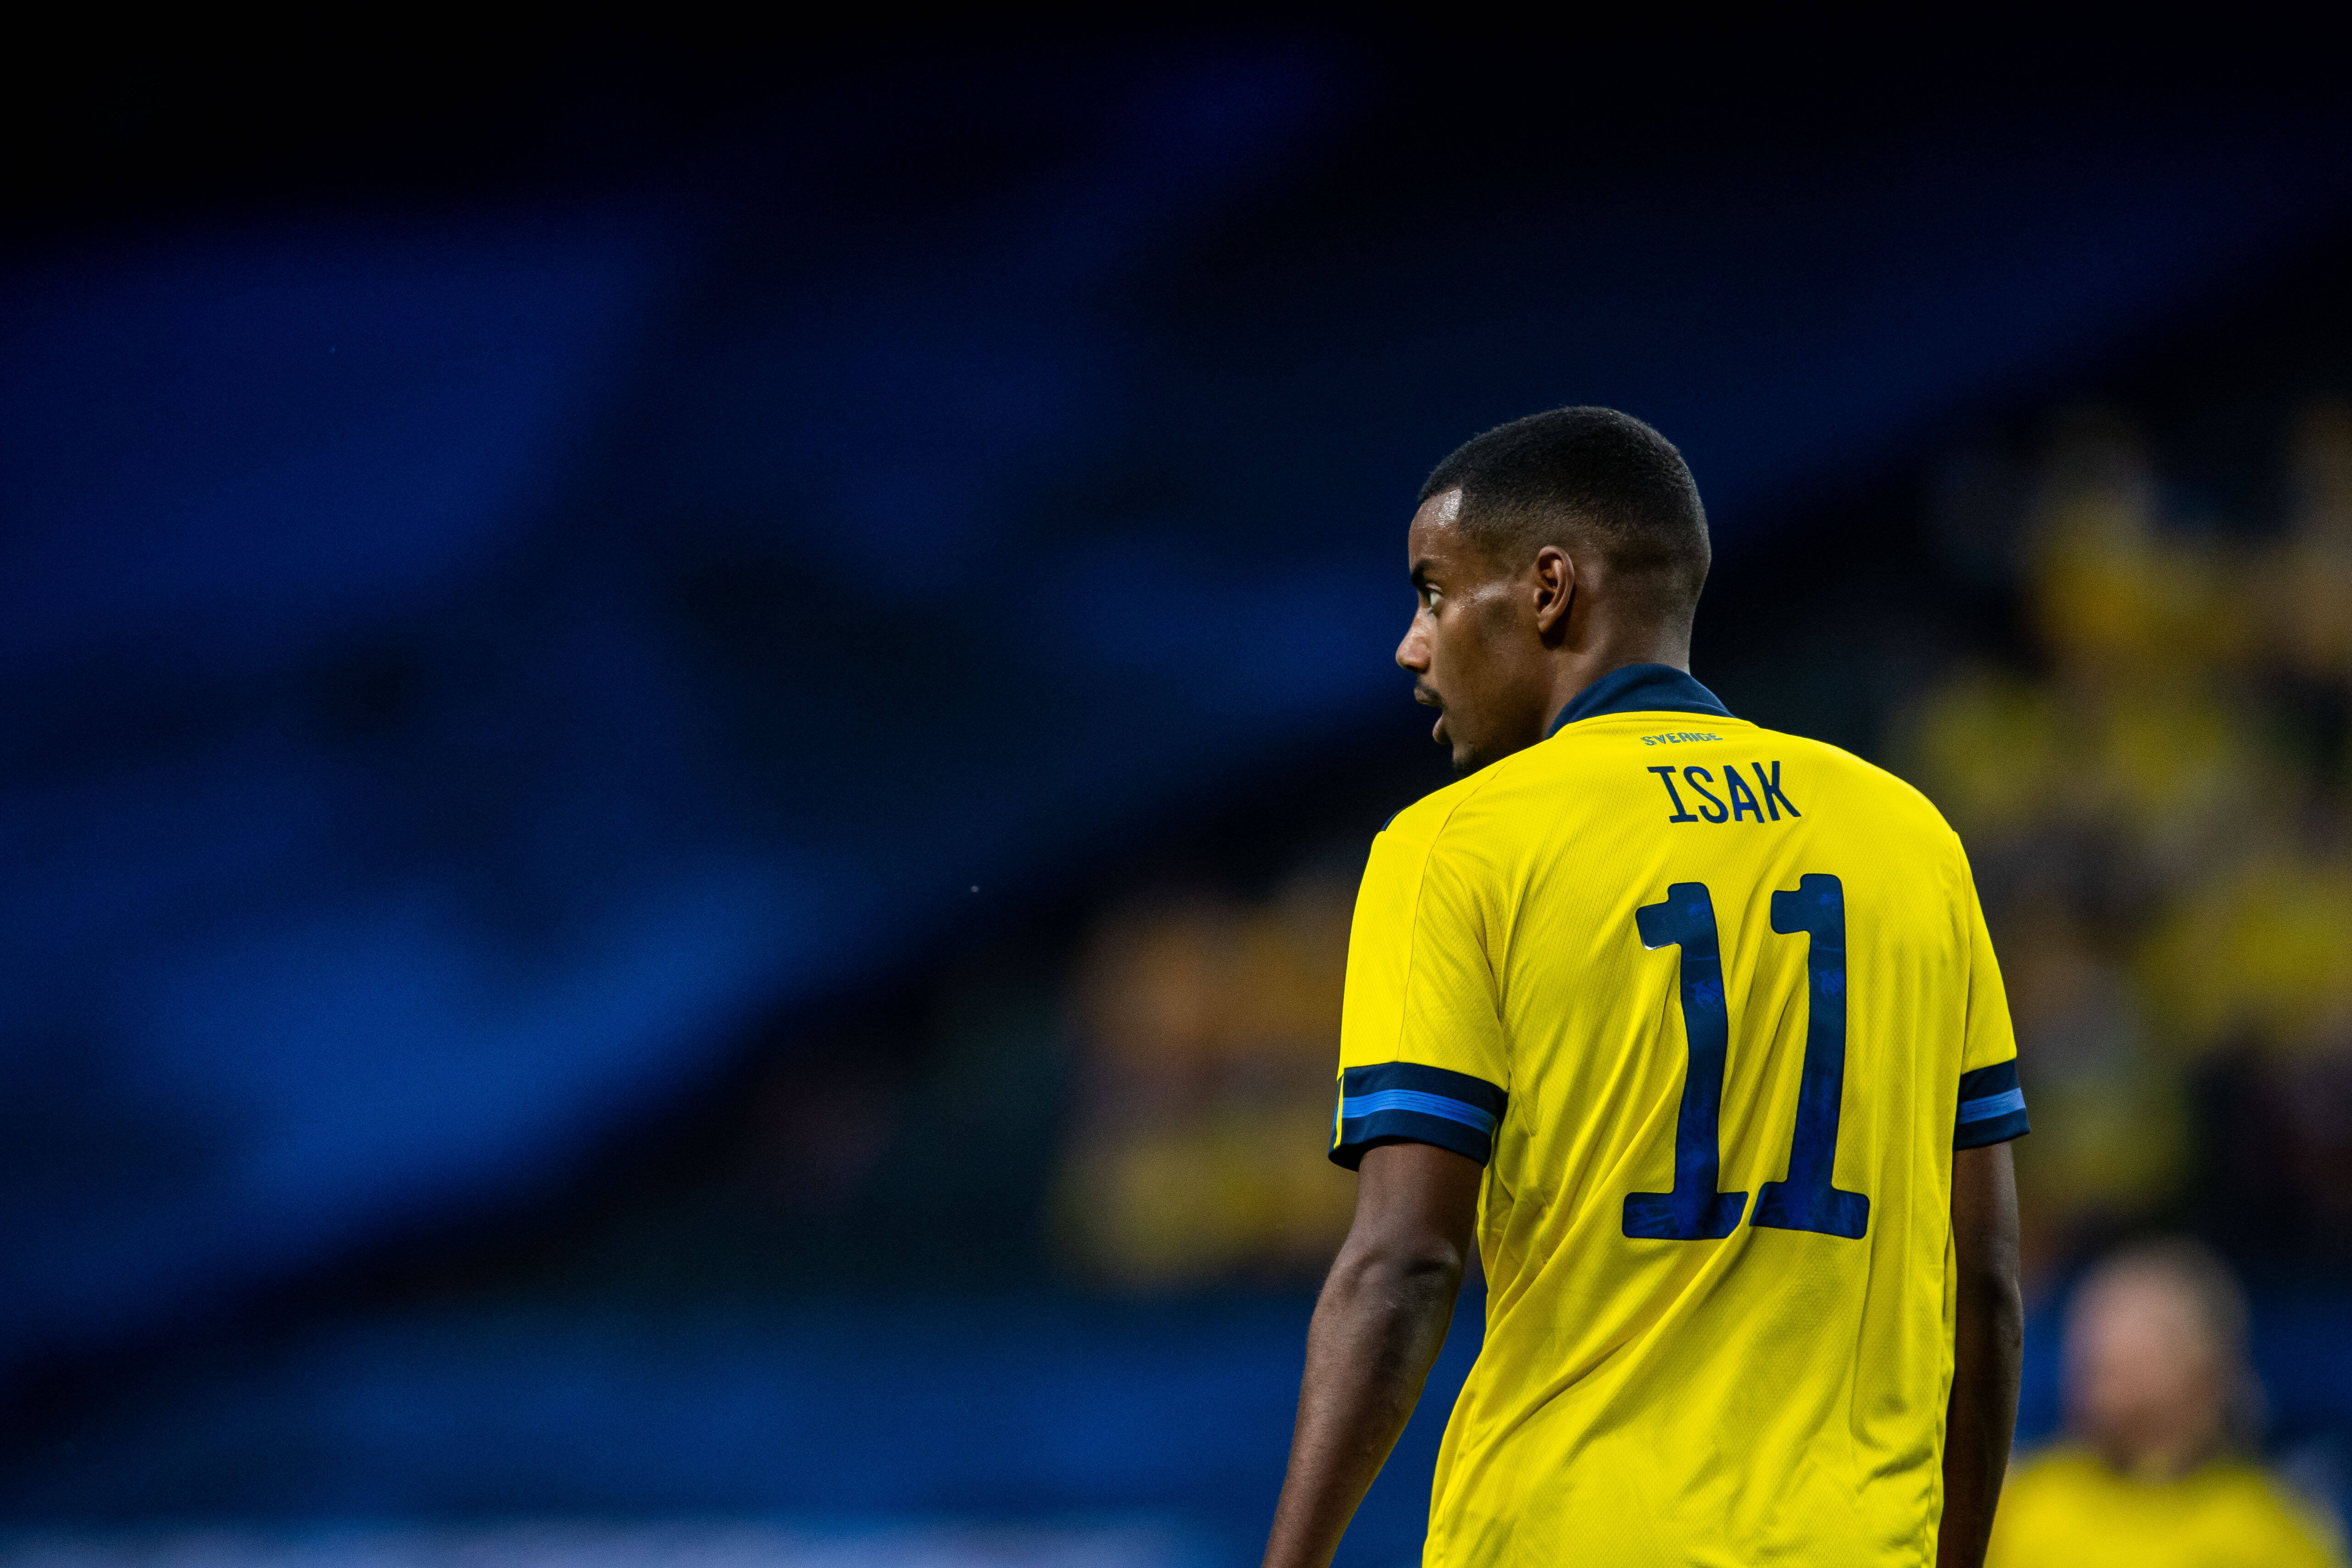 Real Sociedad in negotiations to buy back Borussia Dortmund's buy-back clause in Alexander Isak's contract